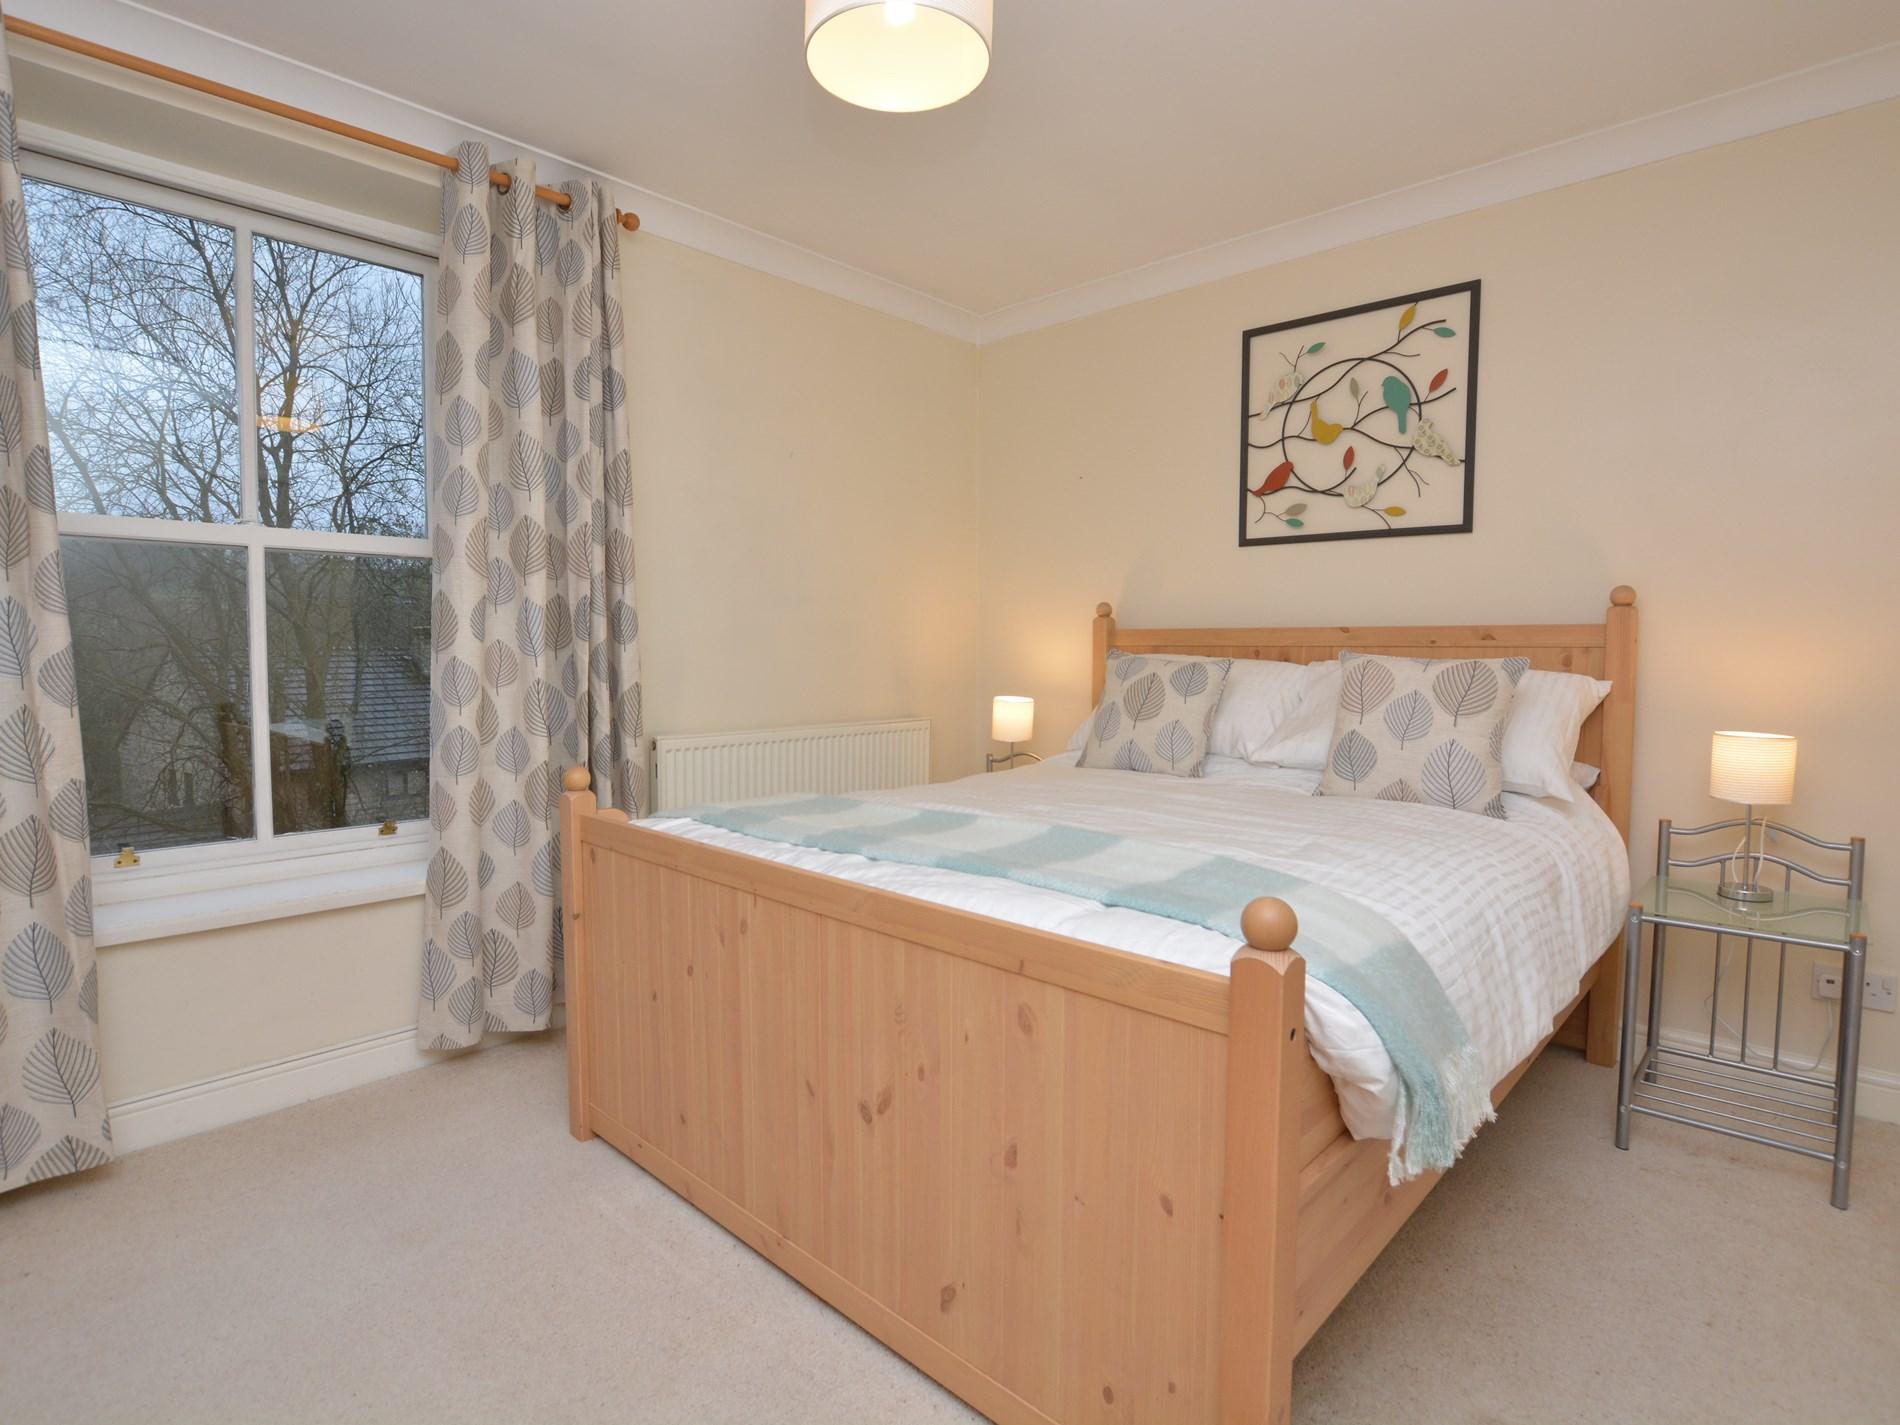 2 Bedroom Cottage in High Peak, Peak District